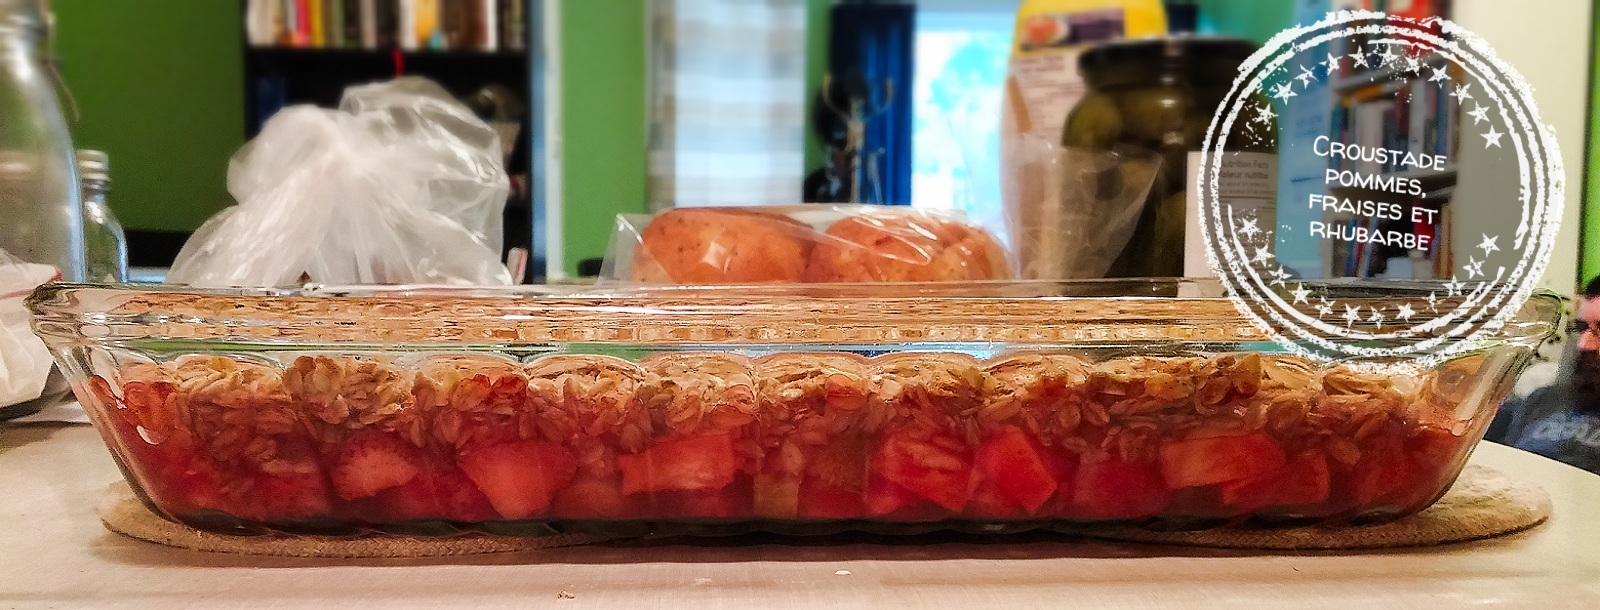 Croustade pommes, fraises et rhubarbe - Auboutdelalangue.com